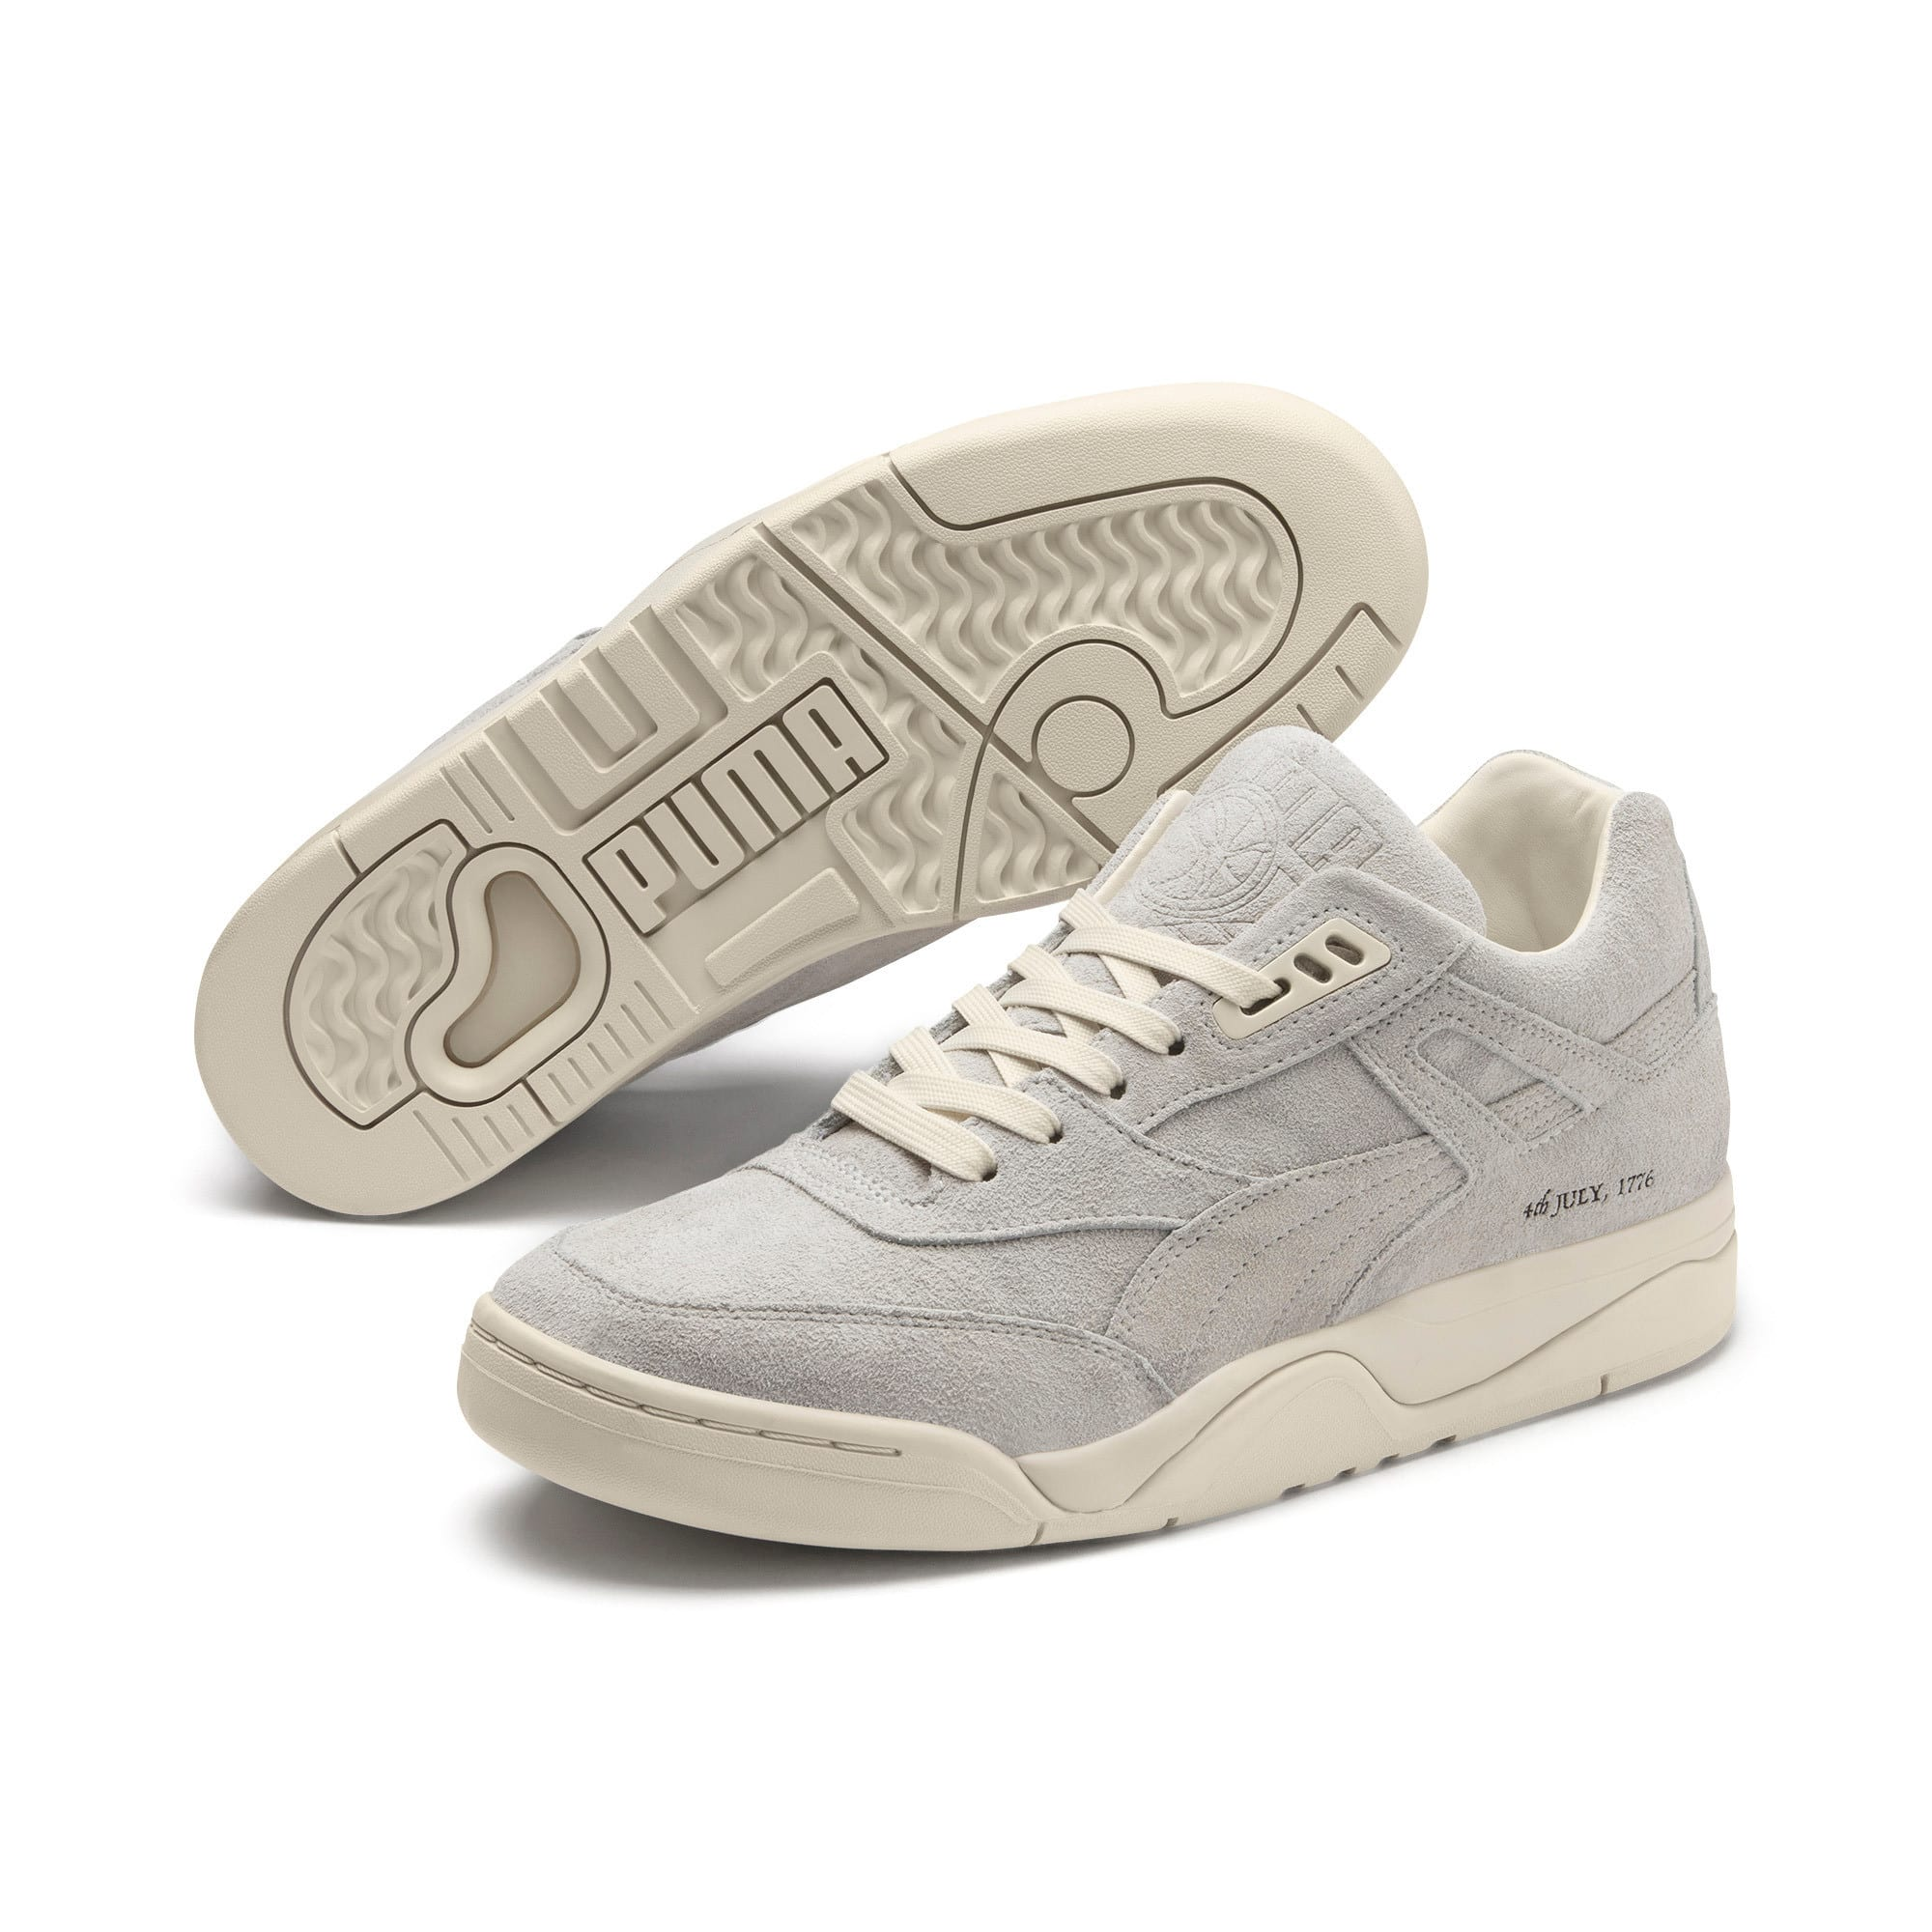 Thumbnail 2 of Palace Guard 4th of July Sneakers, Whisper White-Puma Black, medium